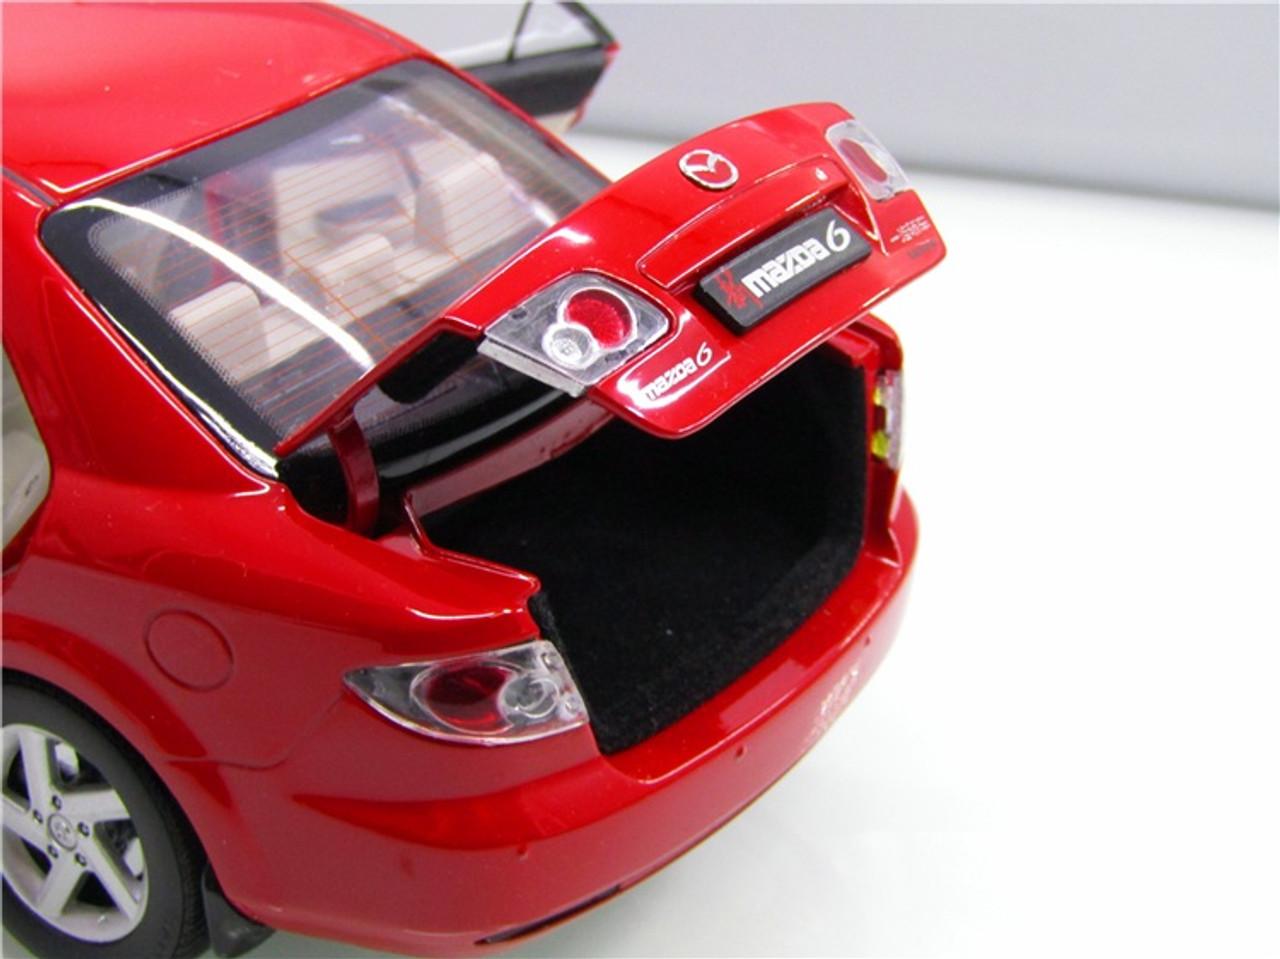 RARE 1/18 Dealer Edition 1st Generation 2002-2008 Mazda 6 / Atenza (Red) Diecast Car Model